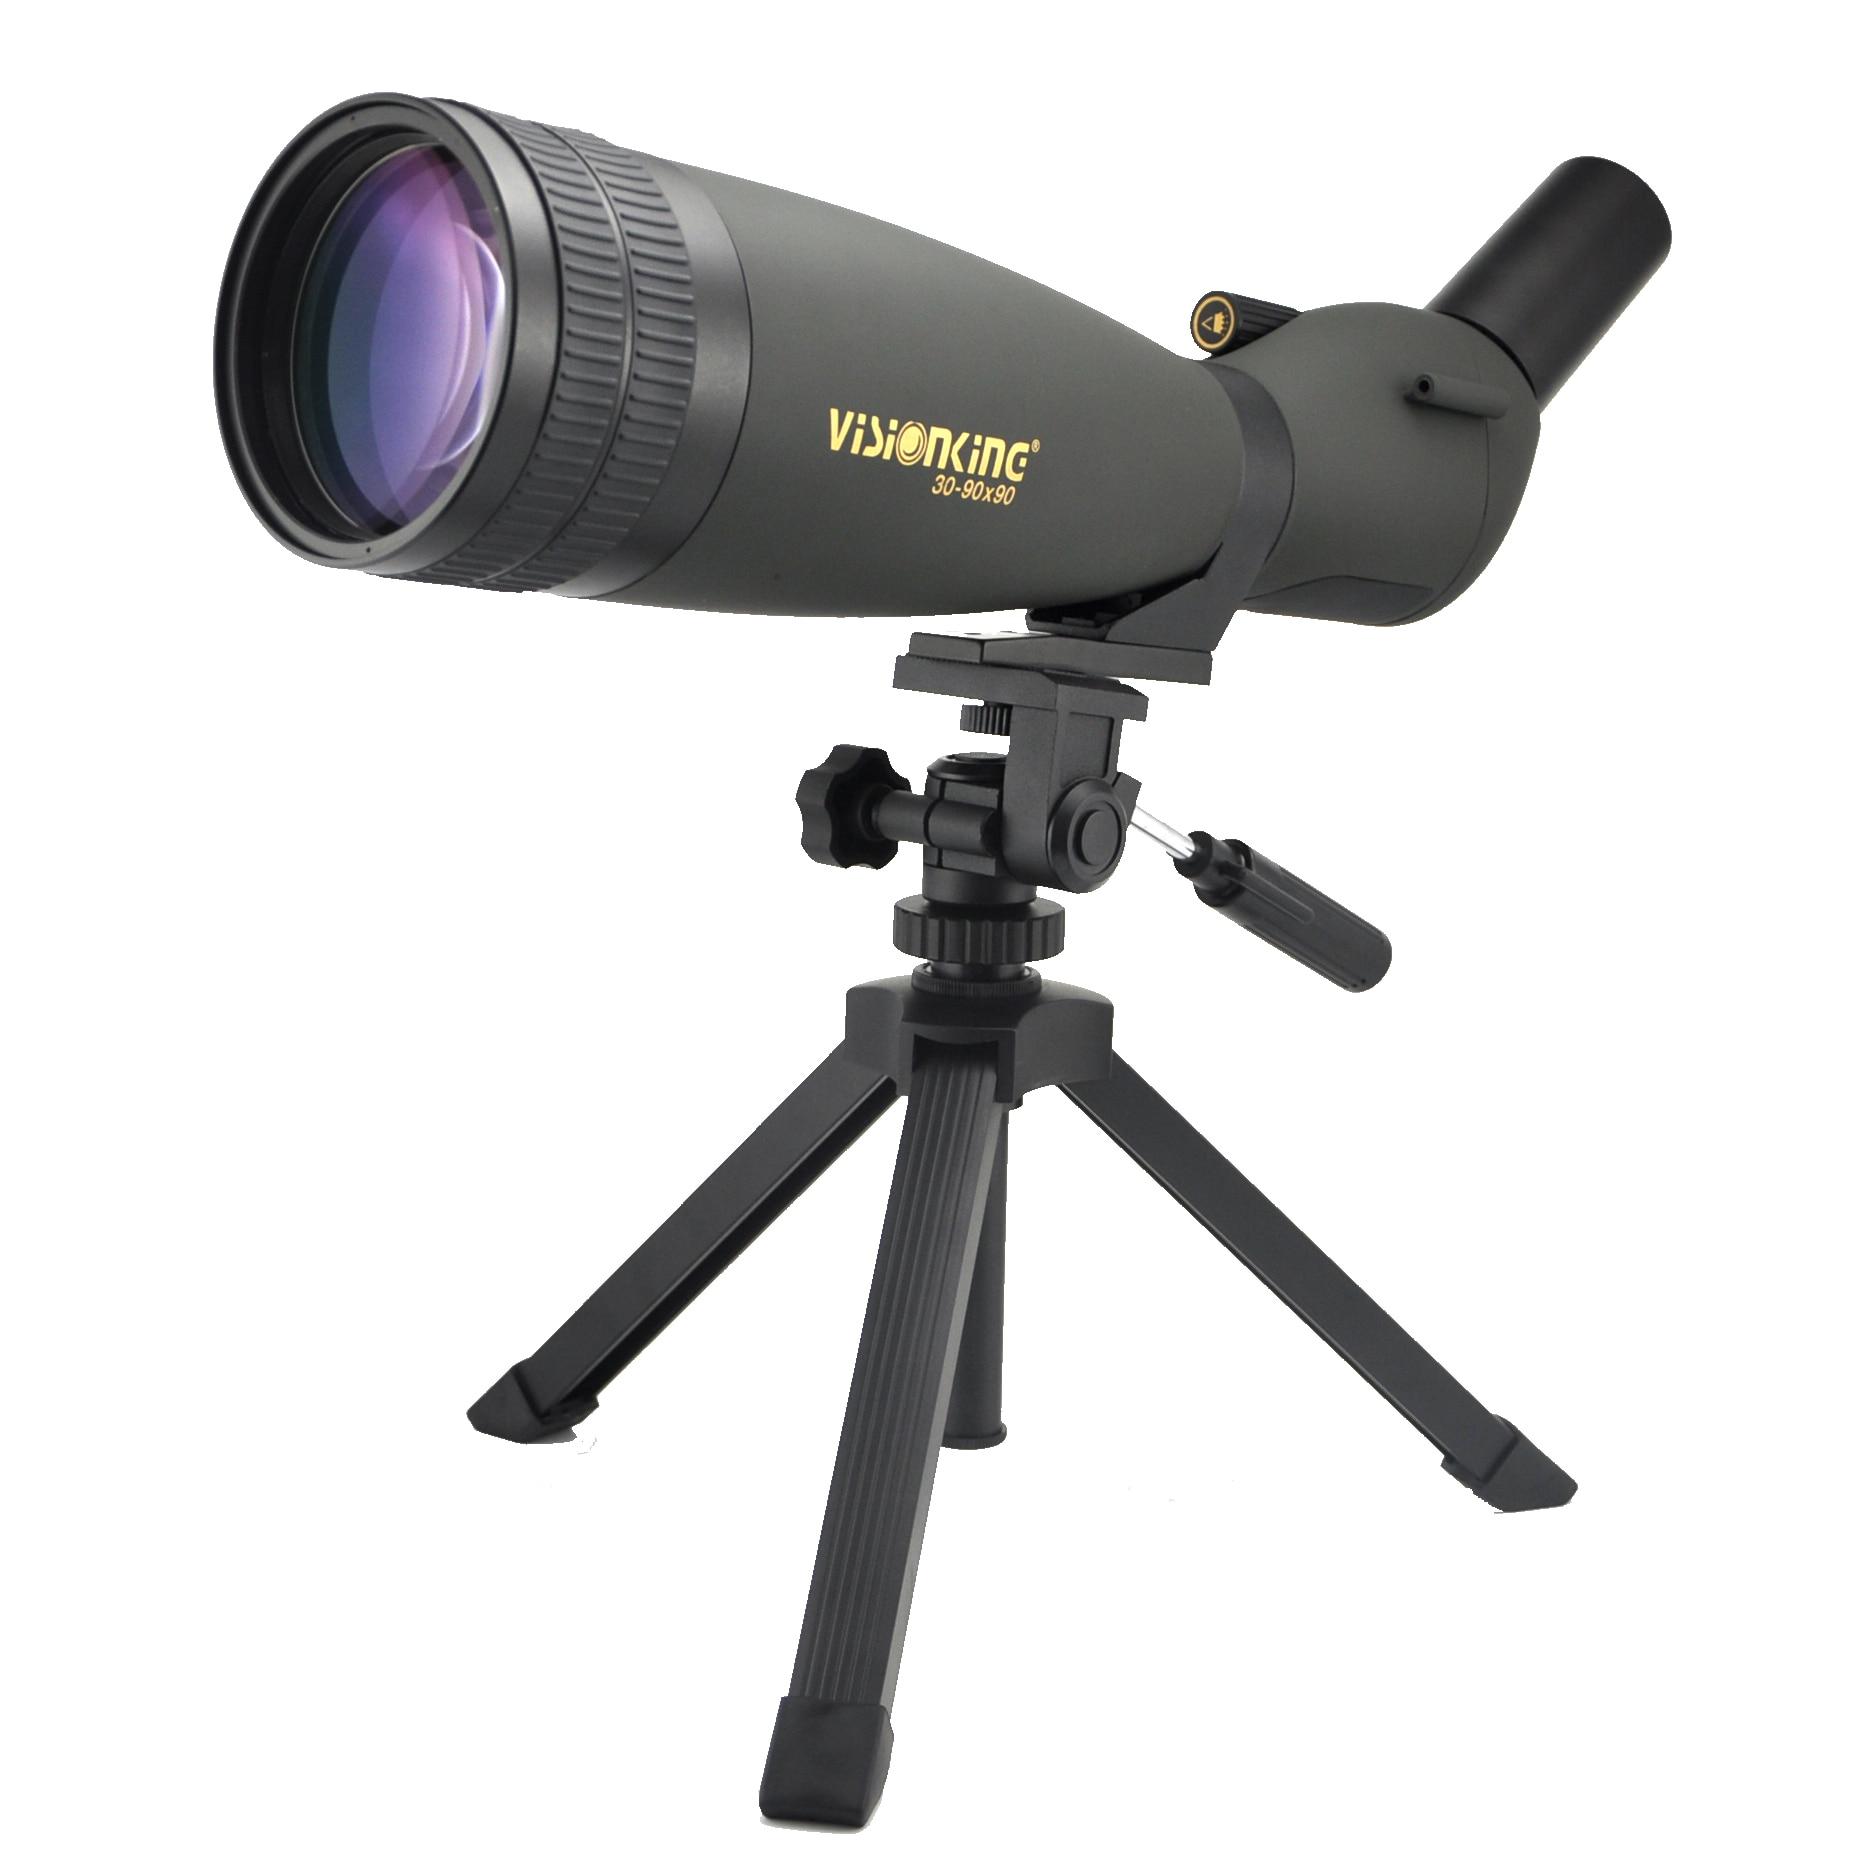 Visionking 30-90x90 45° Angled Spotting Scope W//Phone Adaptor Waterproof Tripod